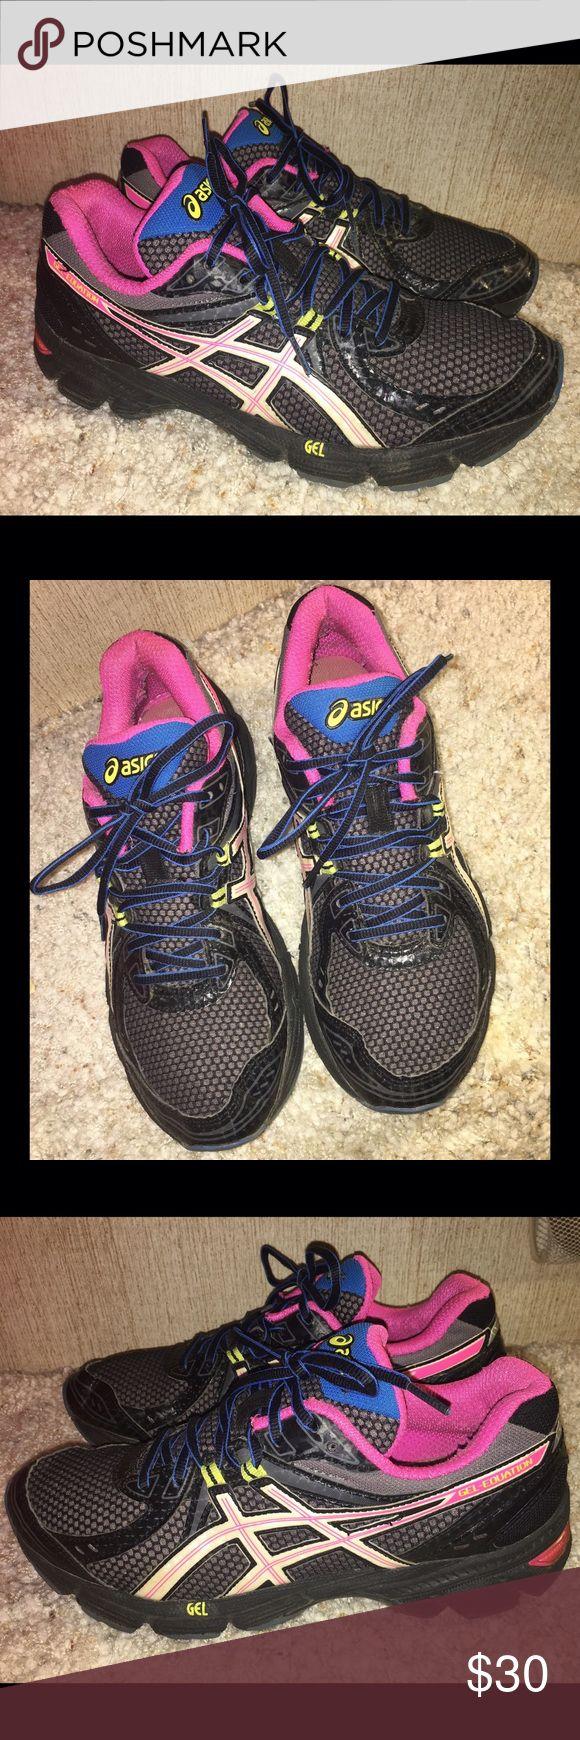 Asics Women's Athletic Shoes Size 9.5 Asics Women's Athletic Shoes Size 9.5- Gently Used Condition Asics Shoes Athletic Shoes